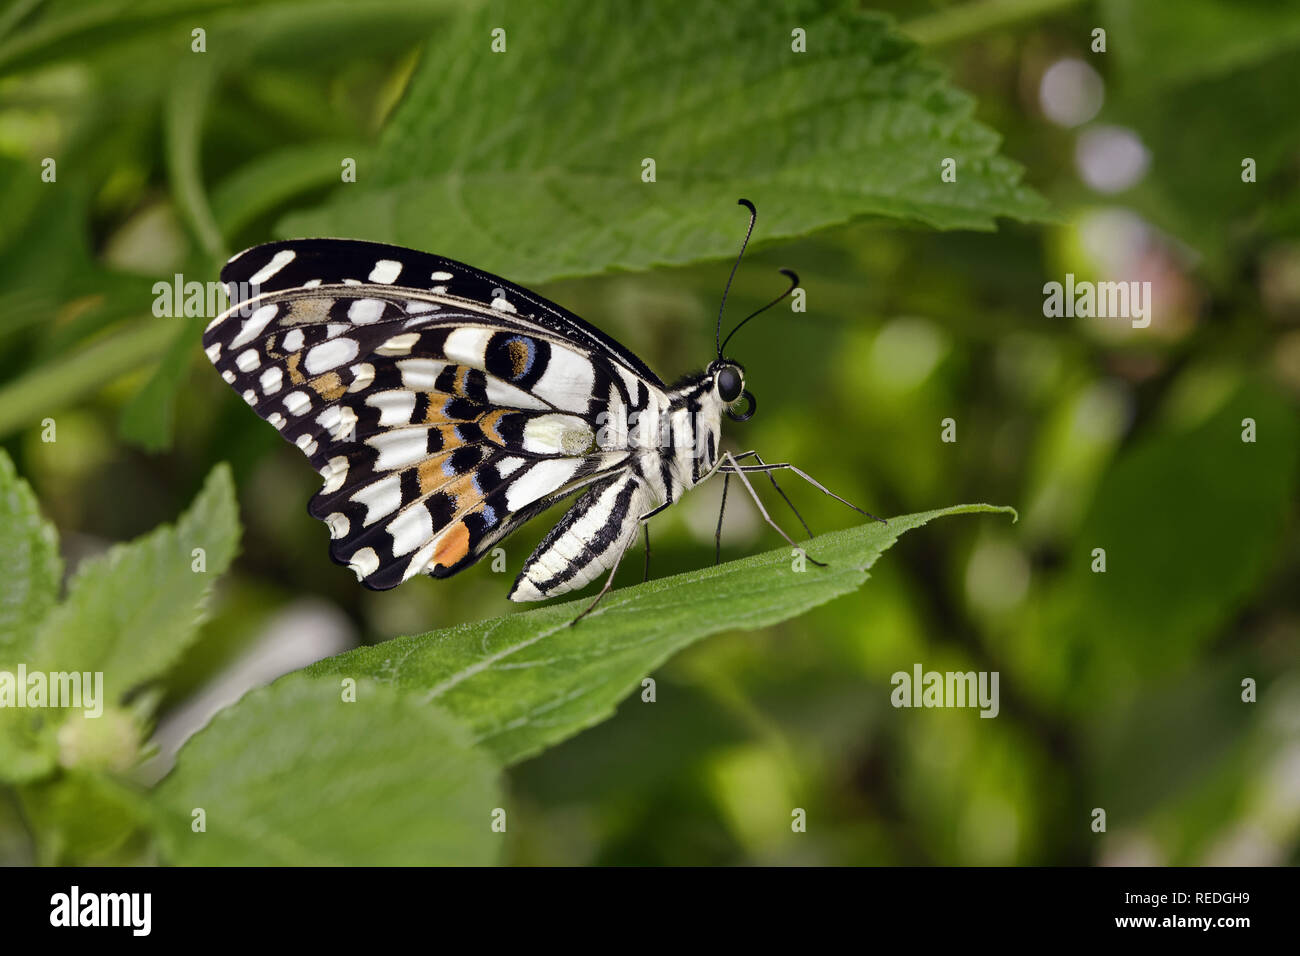 Lime butterfly - Papilio demoleus Immagini Stock